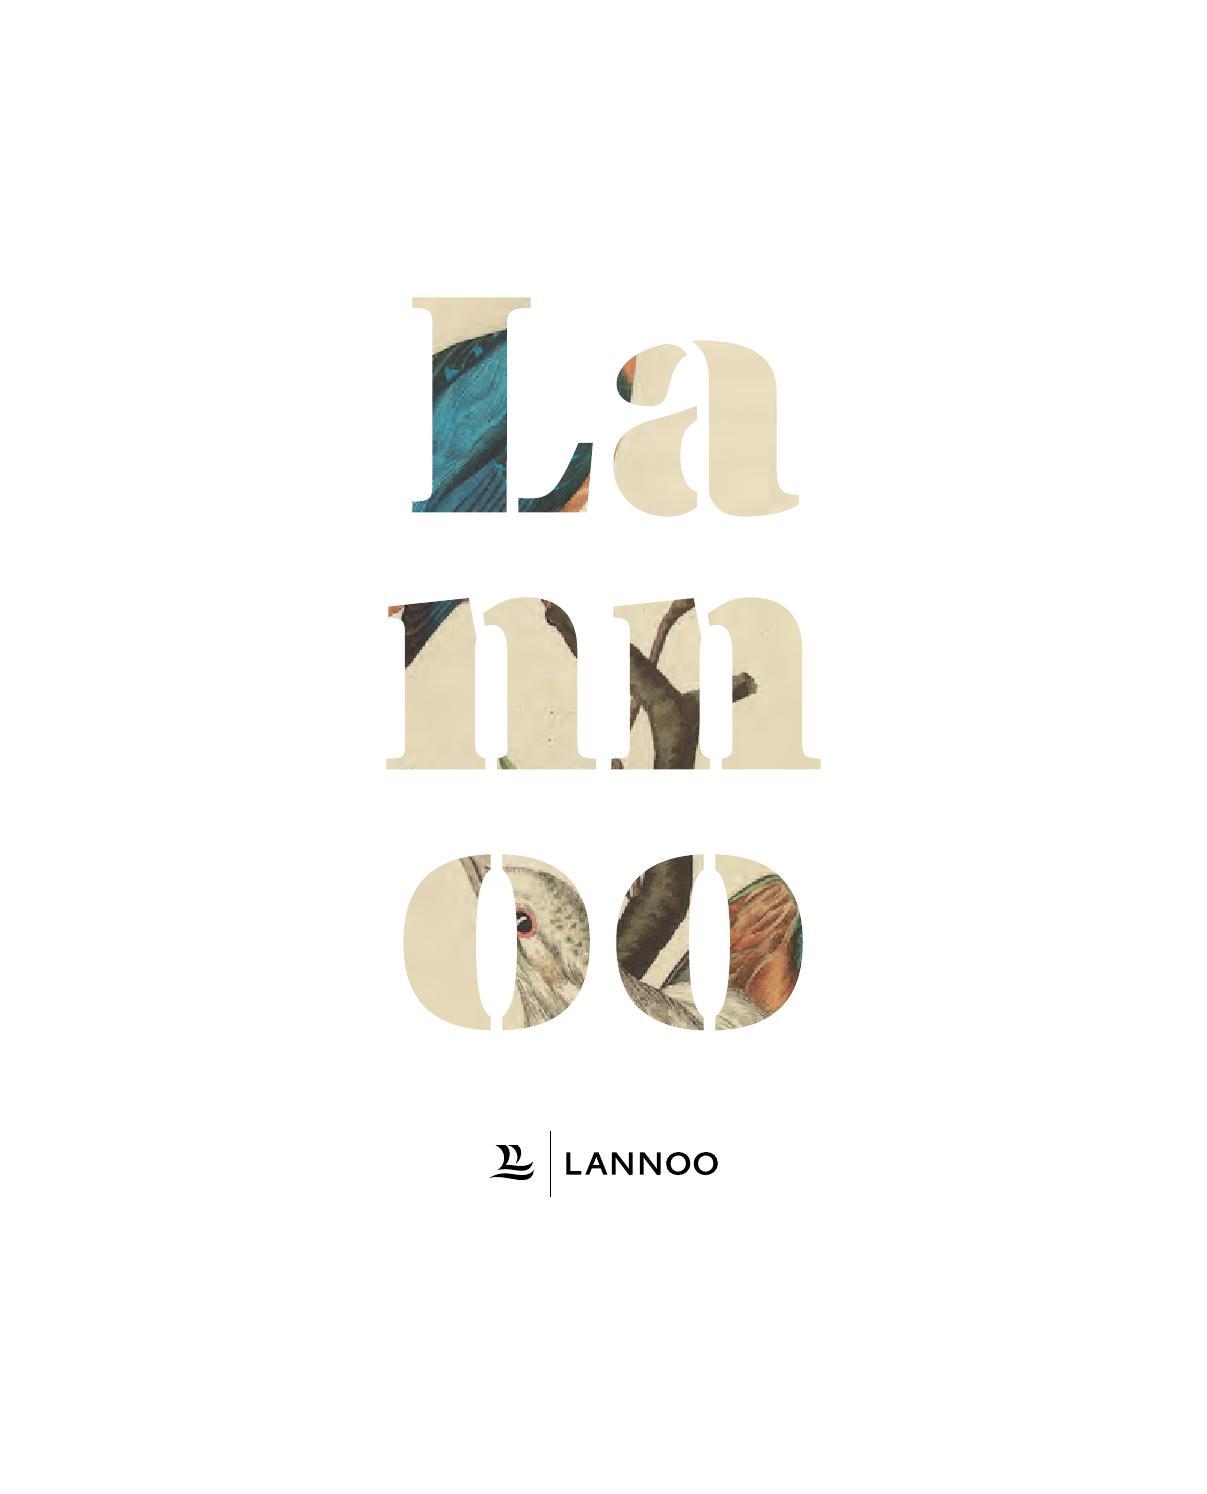 lannoo vl zomeraanbieding 2014 by uitgeverij lannoo   issuu